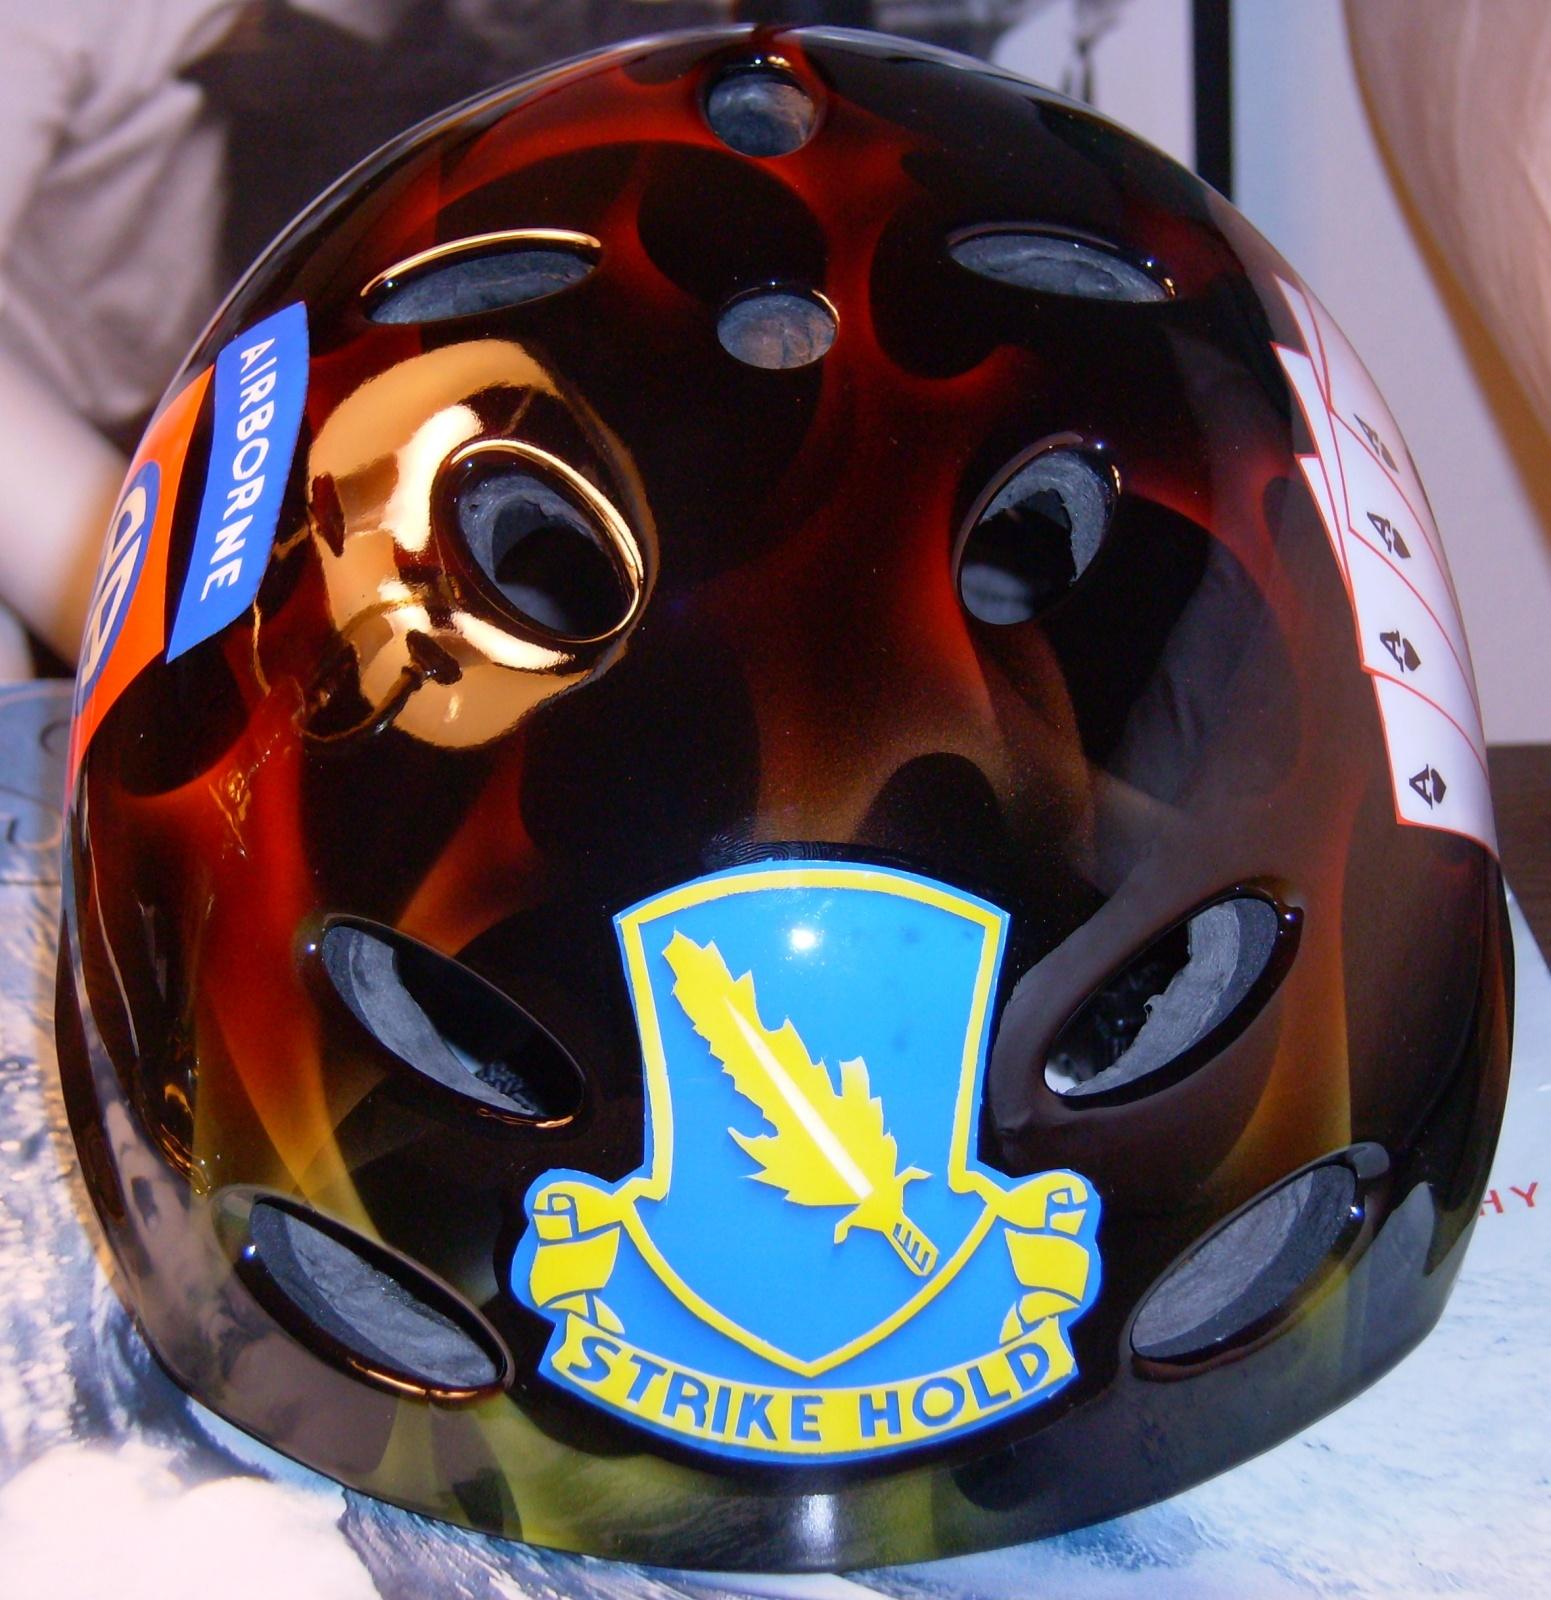 Click image for larger version  Name:Custom kayak helmet 015.jpg Views:187 Size:673.5 KB ID:848